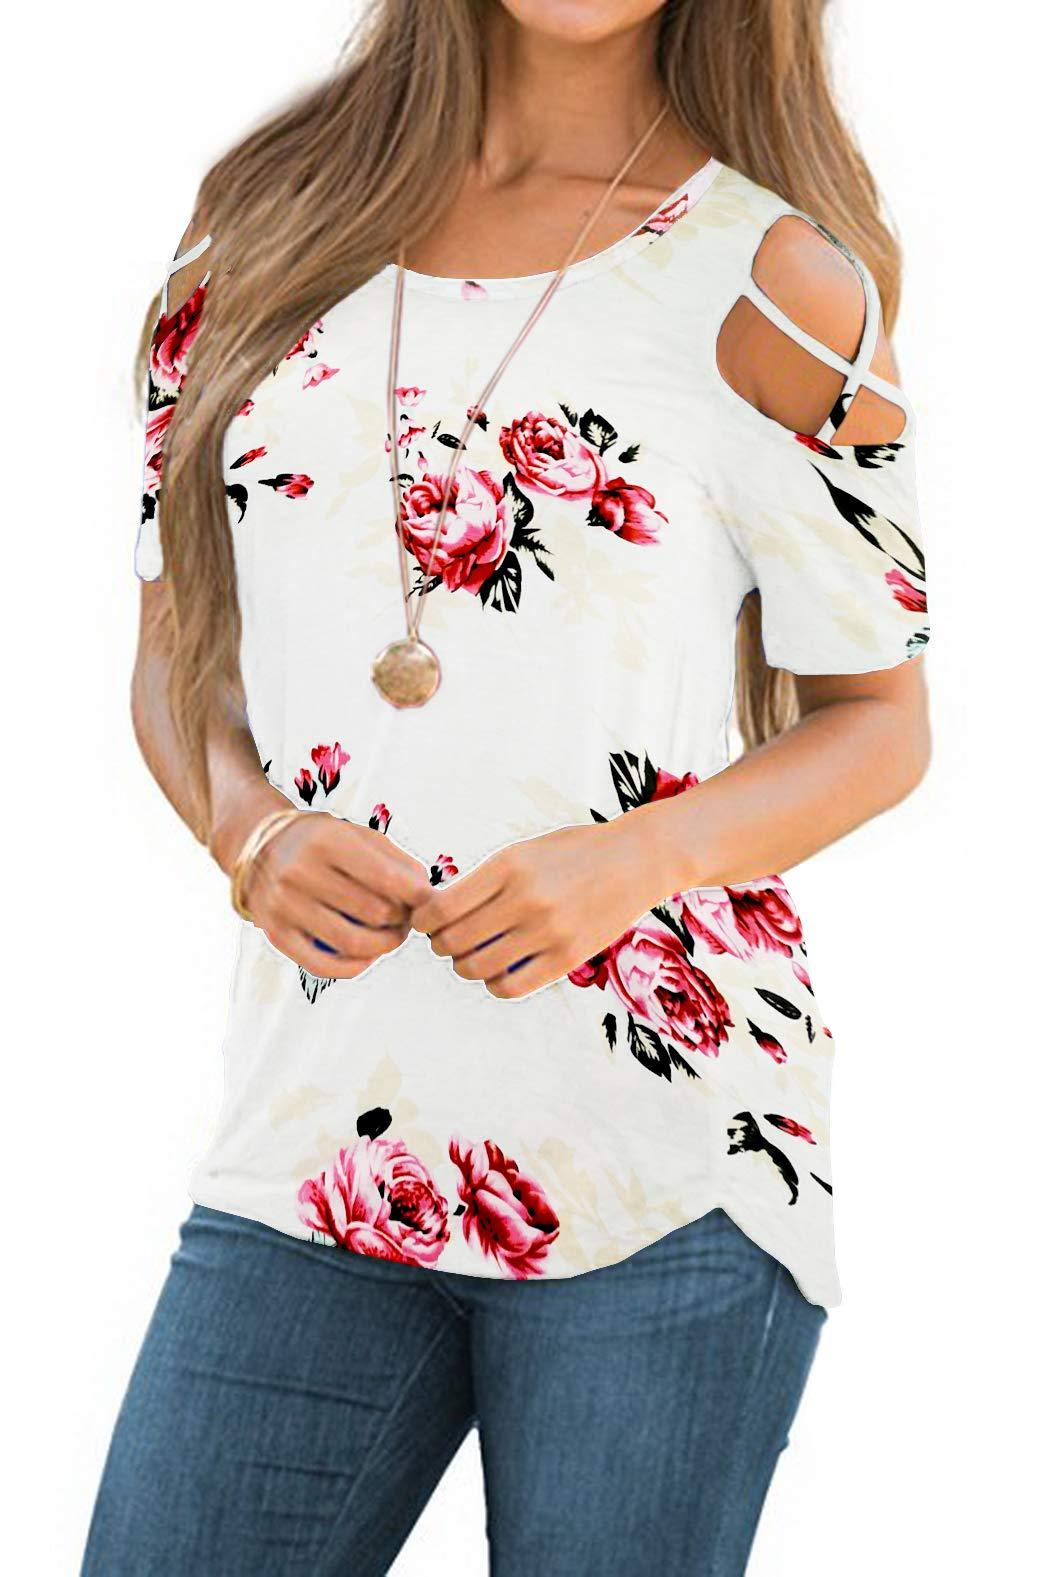 iGENJUN Women Short Sleeve Strappy Cold Shoulder T-Shirt Tops Blouses,S,DG7